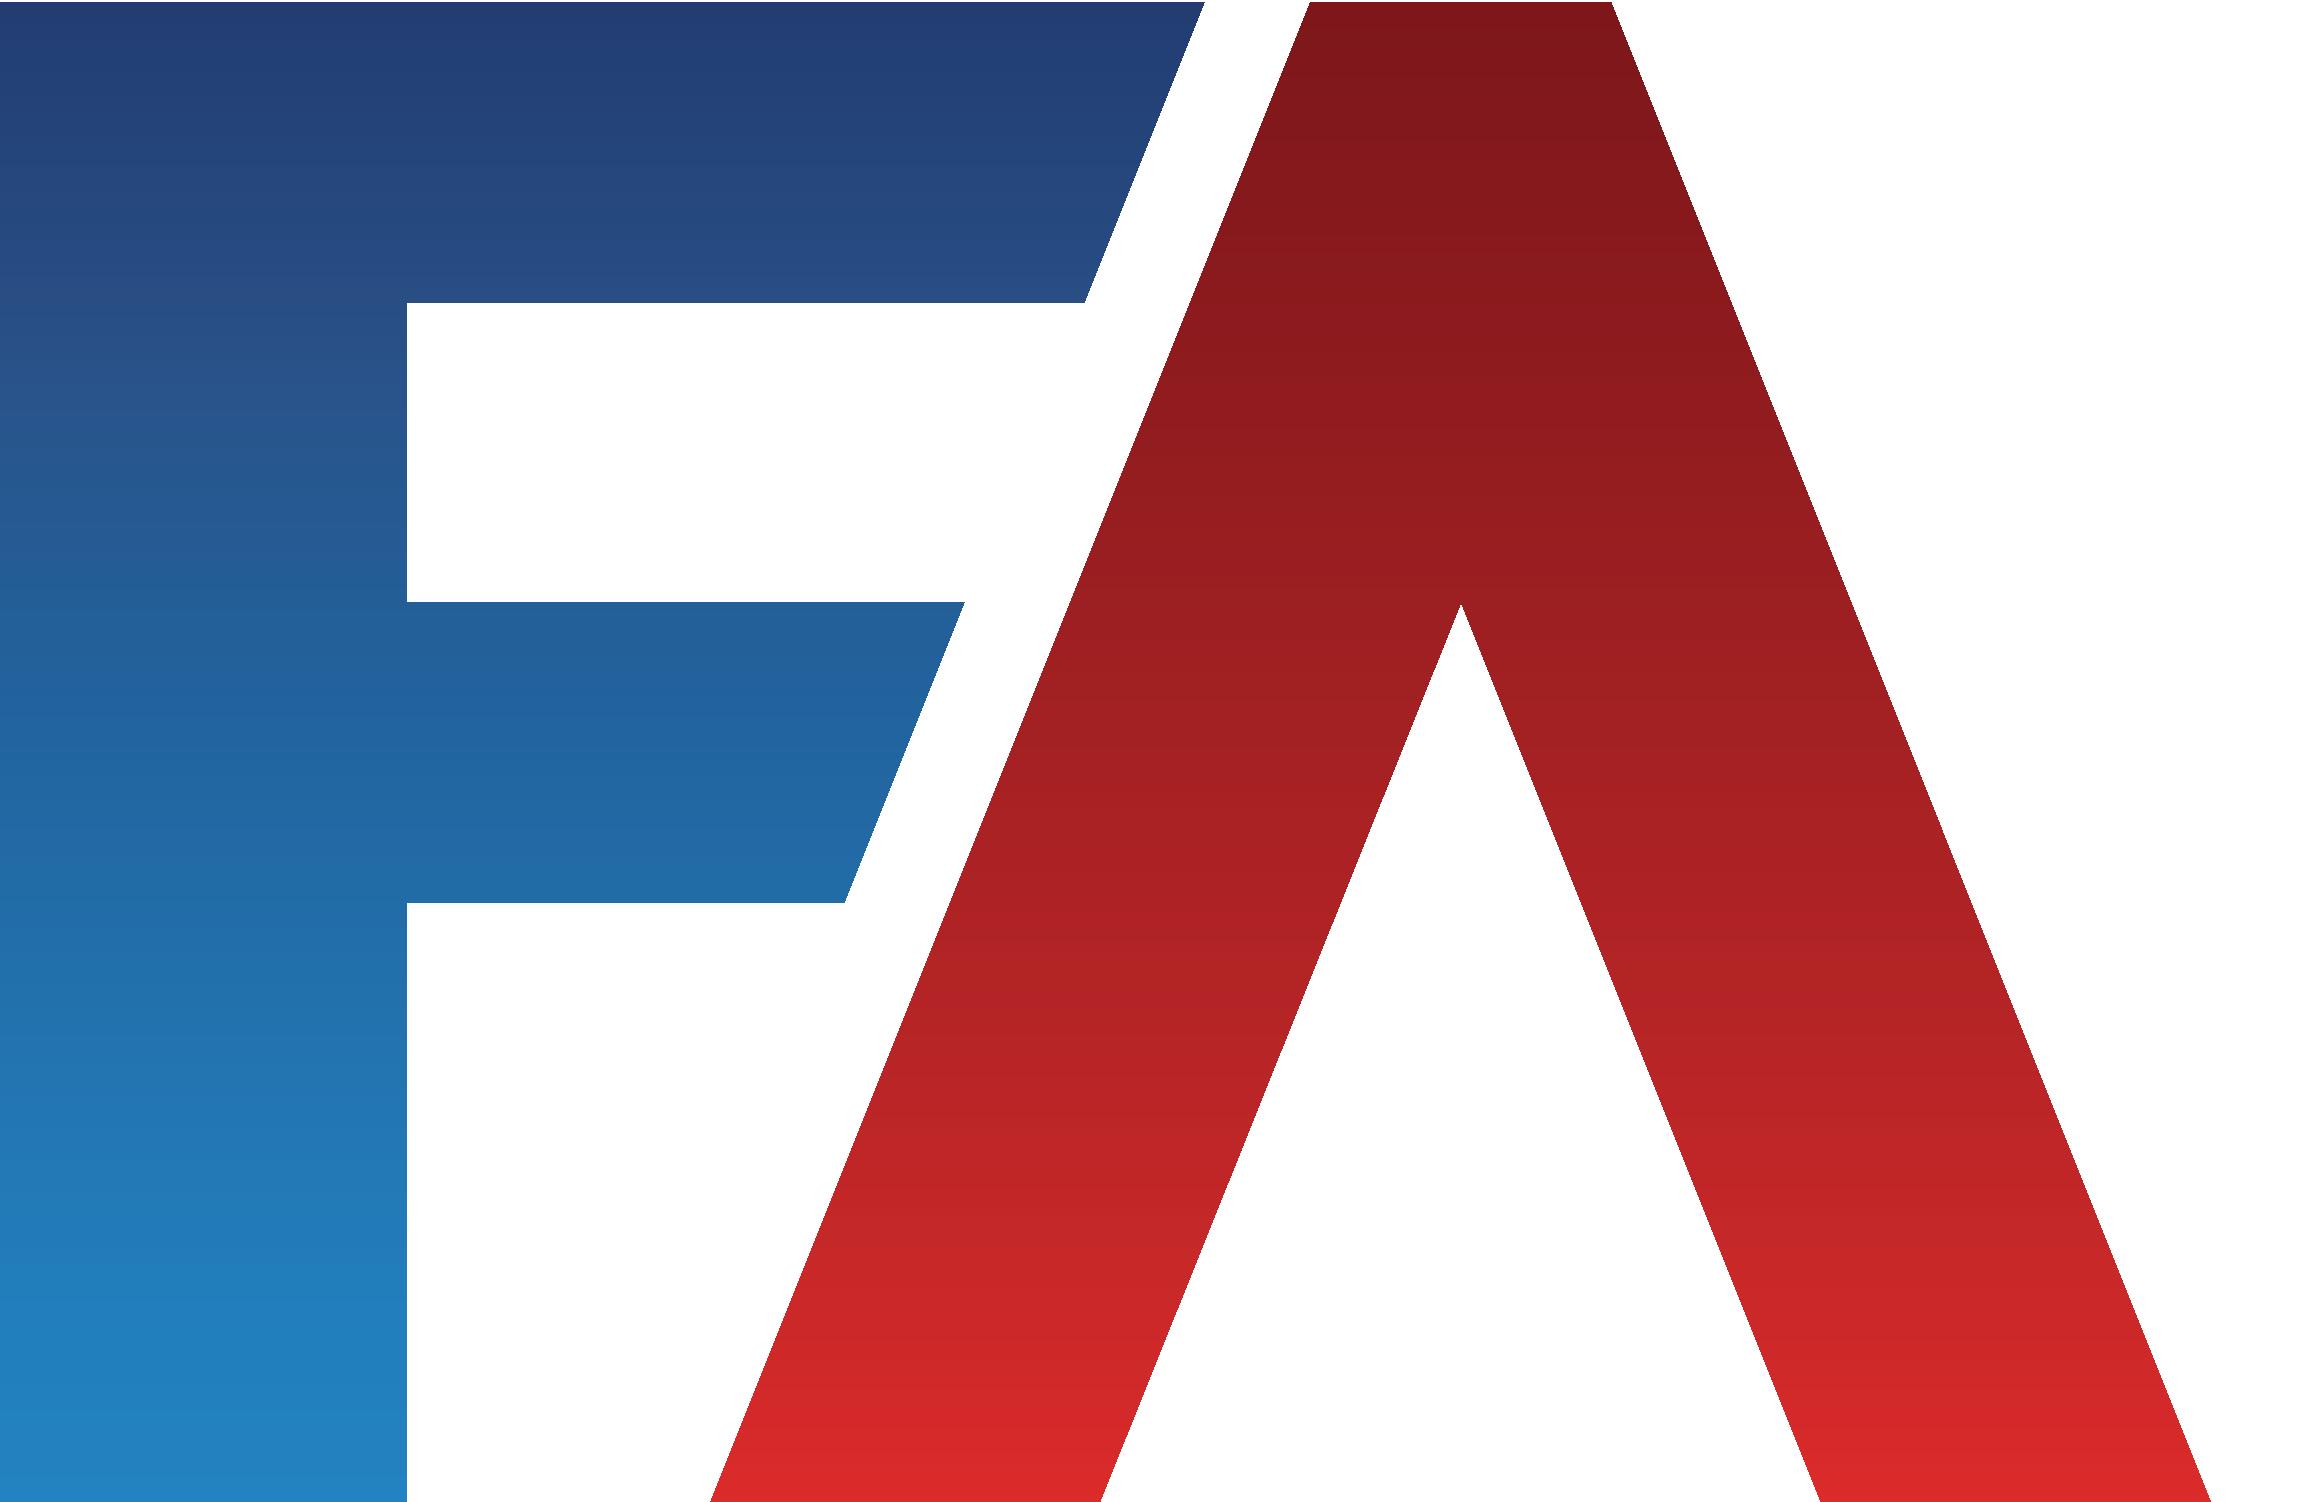 2015 DFS NFL Mon-Thurs: Week 2 | FantasyAlarm.com